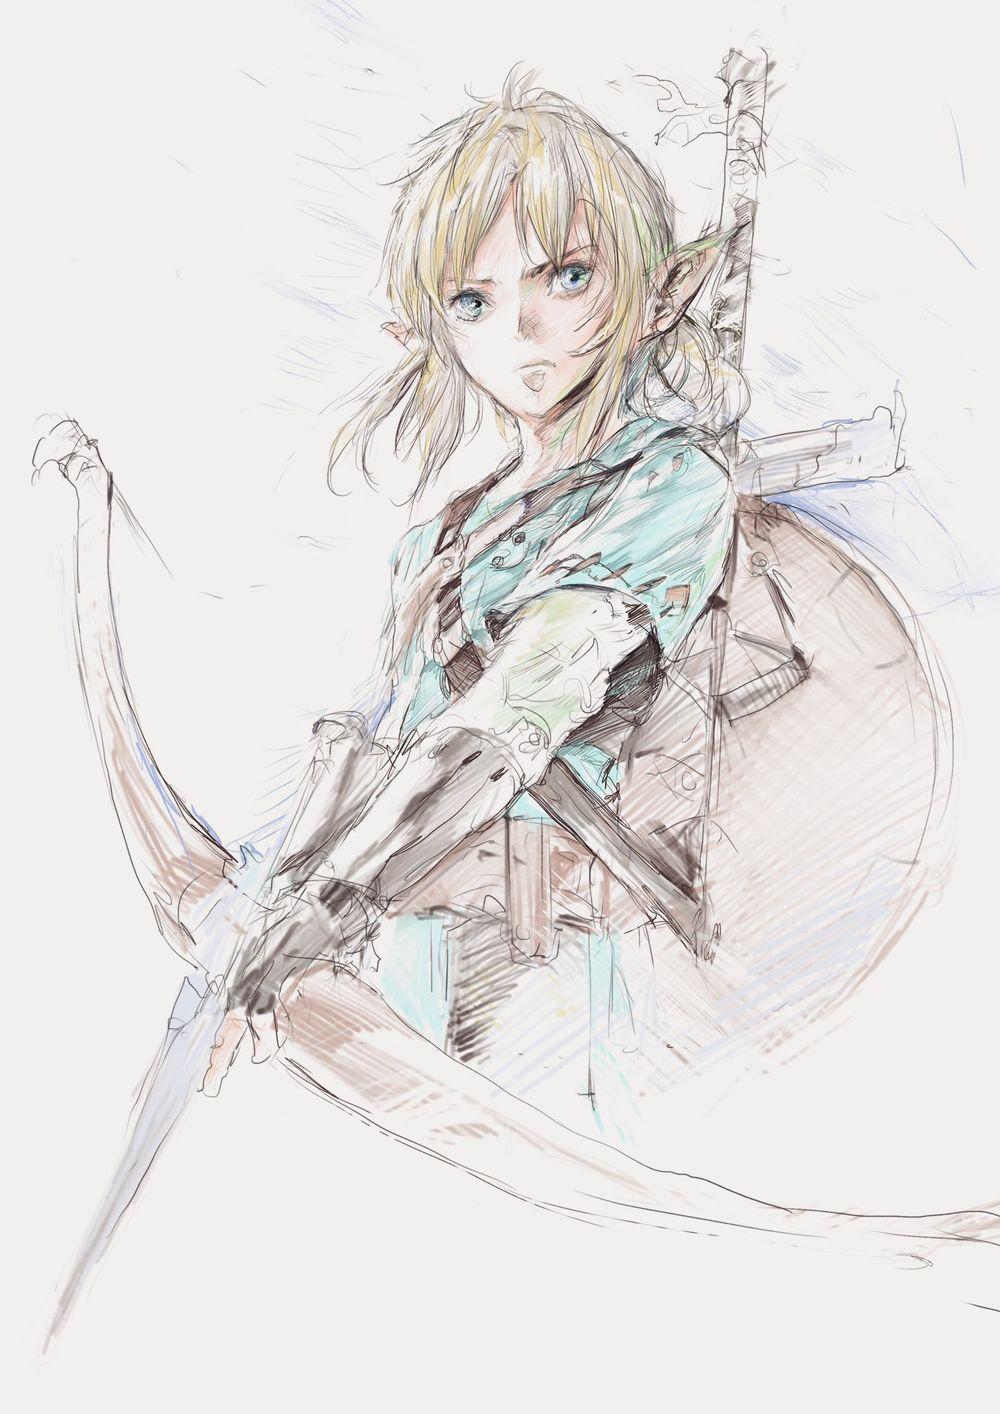 Video Dessin Link De The Legend Of Zelda Breath Of The Wild Par Yocky La Legende De Zelda Jeux Video Arts Dessin Anime